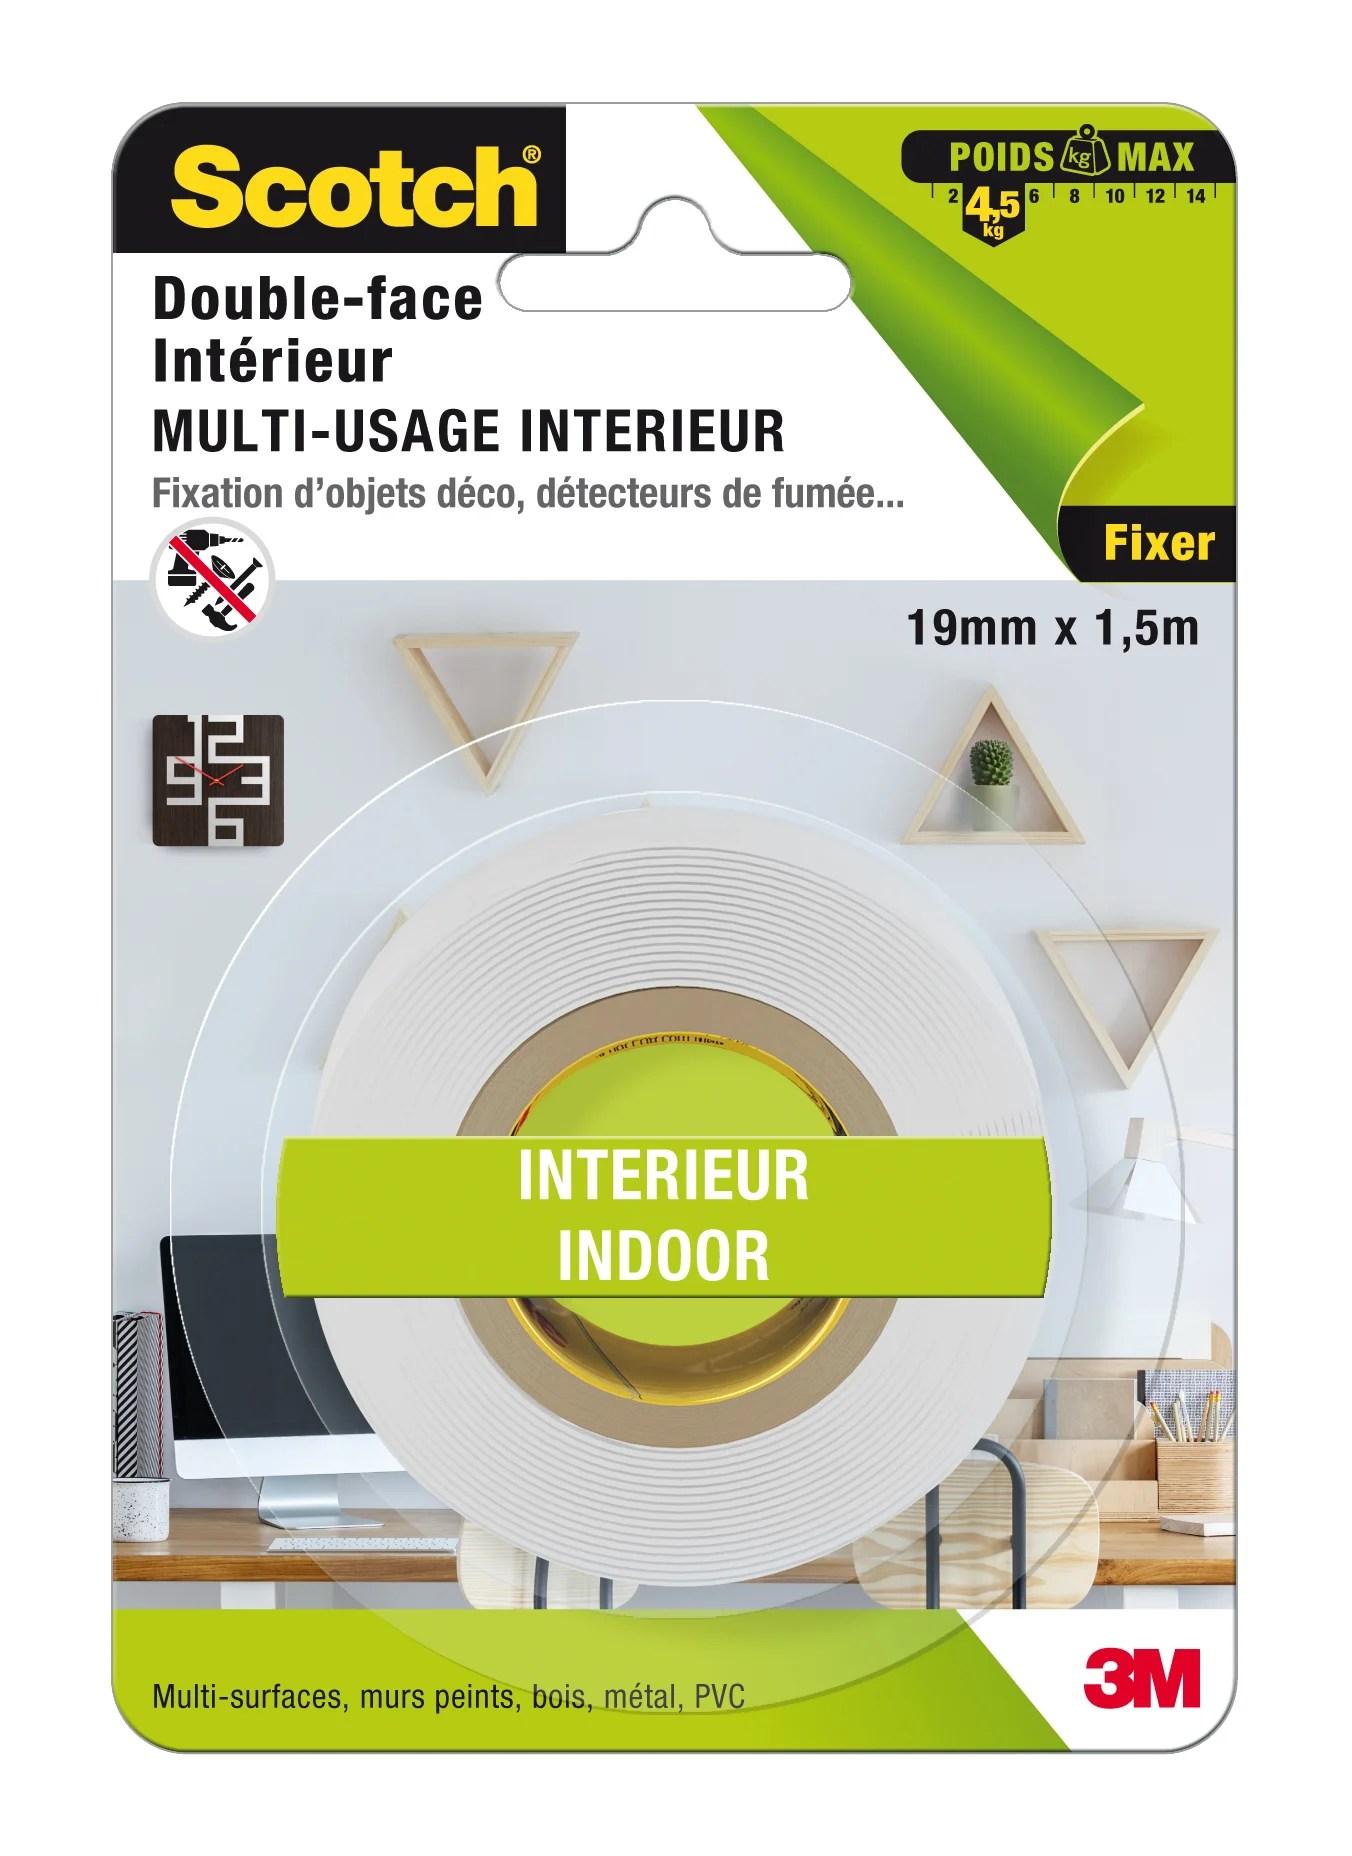 Rouleau Adhesif Double Face Multi Usage Interieur Scotch L 1 5 M X L 19 Mm Leroy Merlin